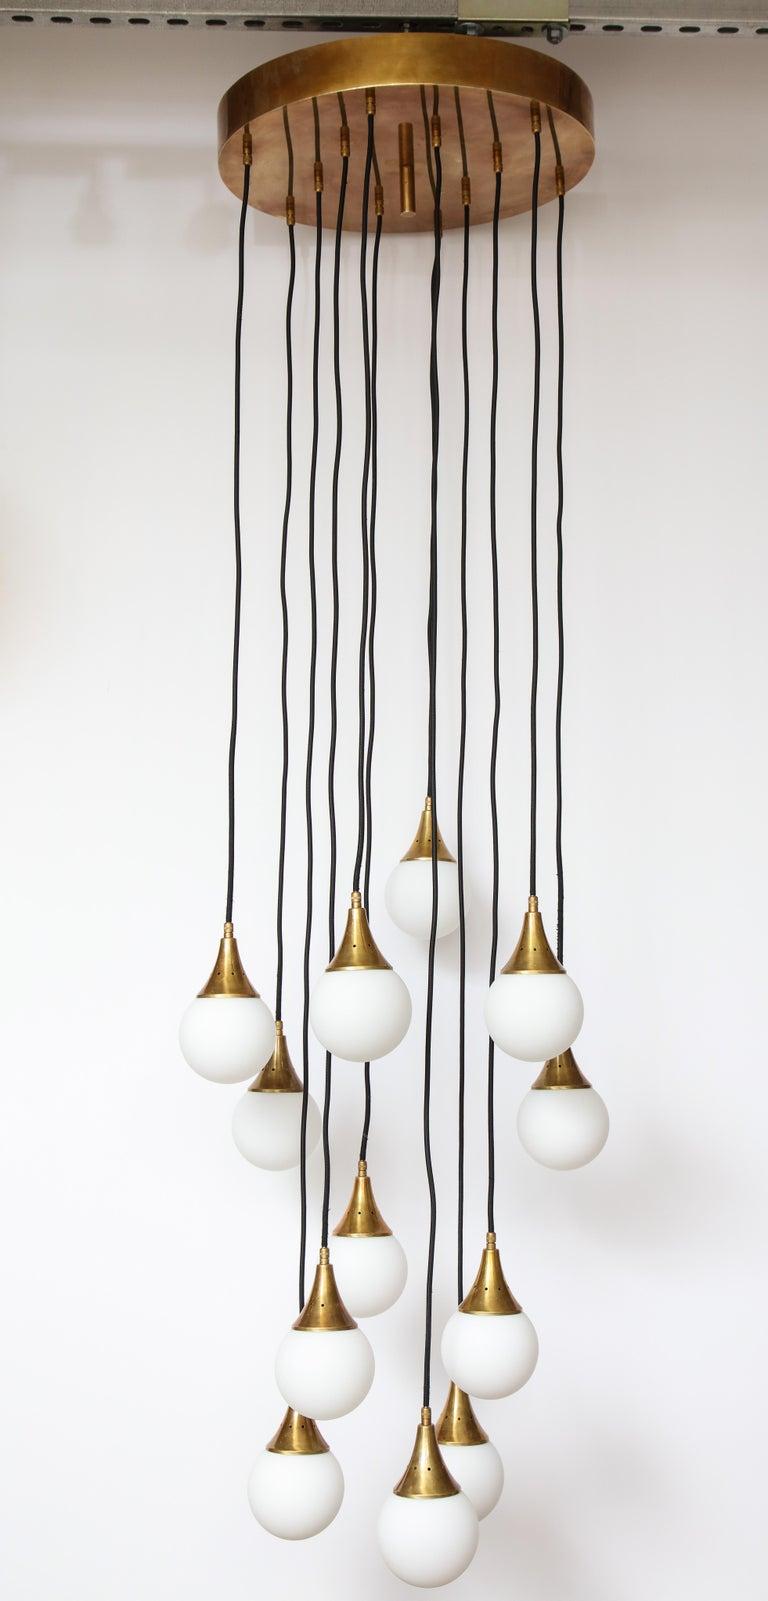 Stilnovo Cascading Chandelier with Twelve Opaline Glass Lights For Sale 4